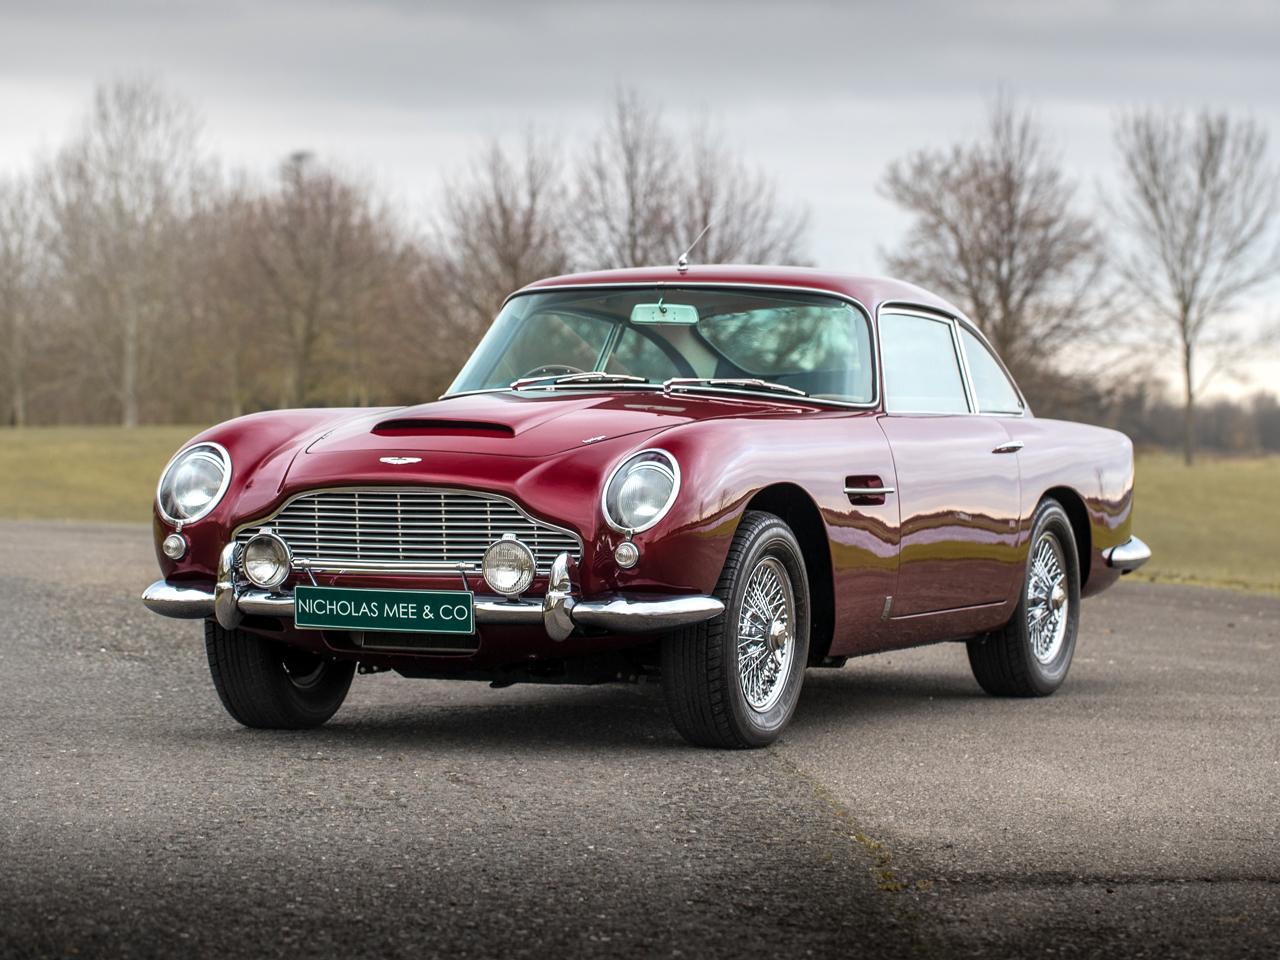 Aston Martin DB5 ex Robert Plant - 1965 for sale | Autoclassics.com